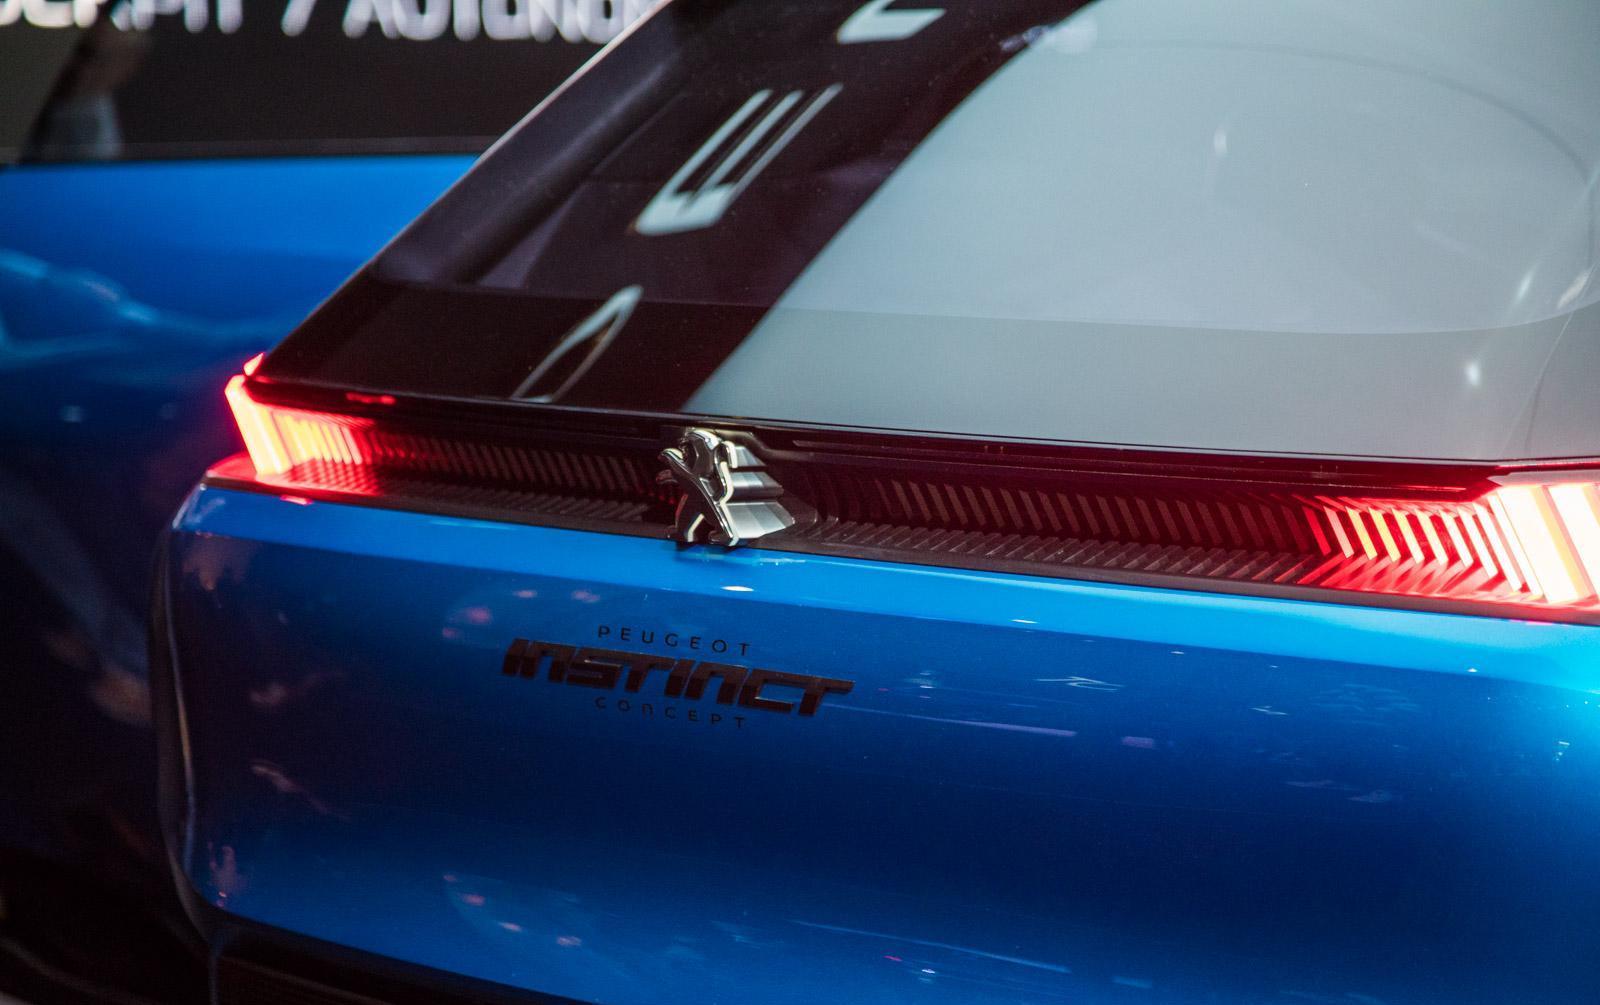 Peugeot-instinct-concept-015